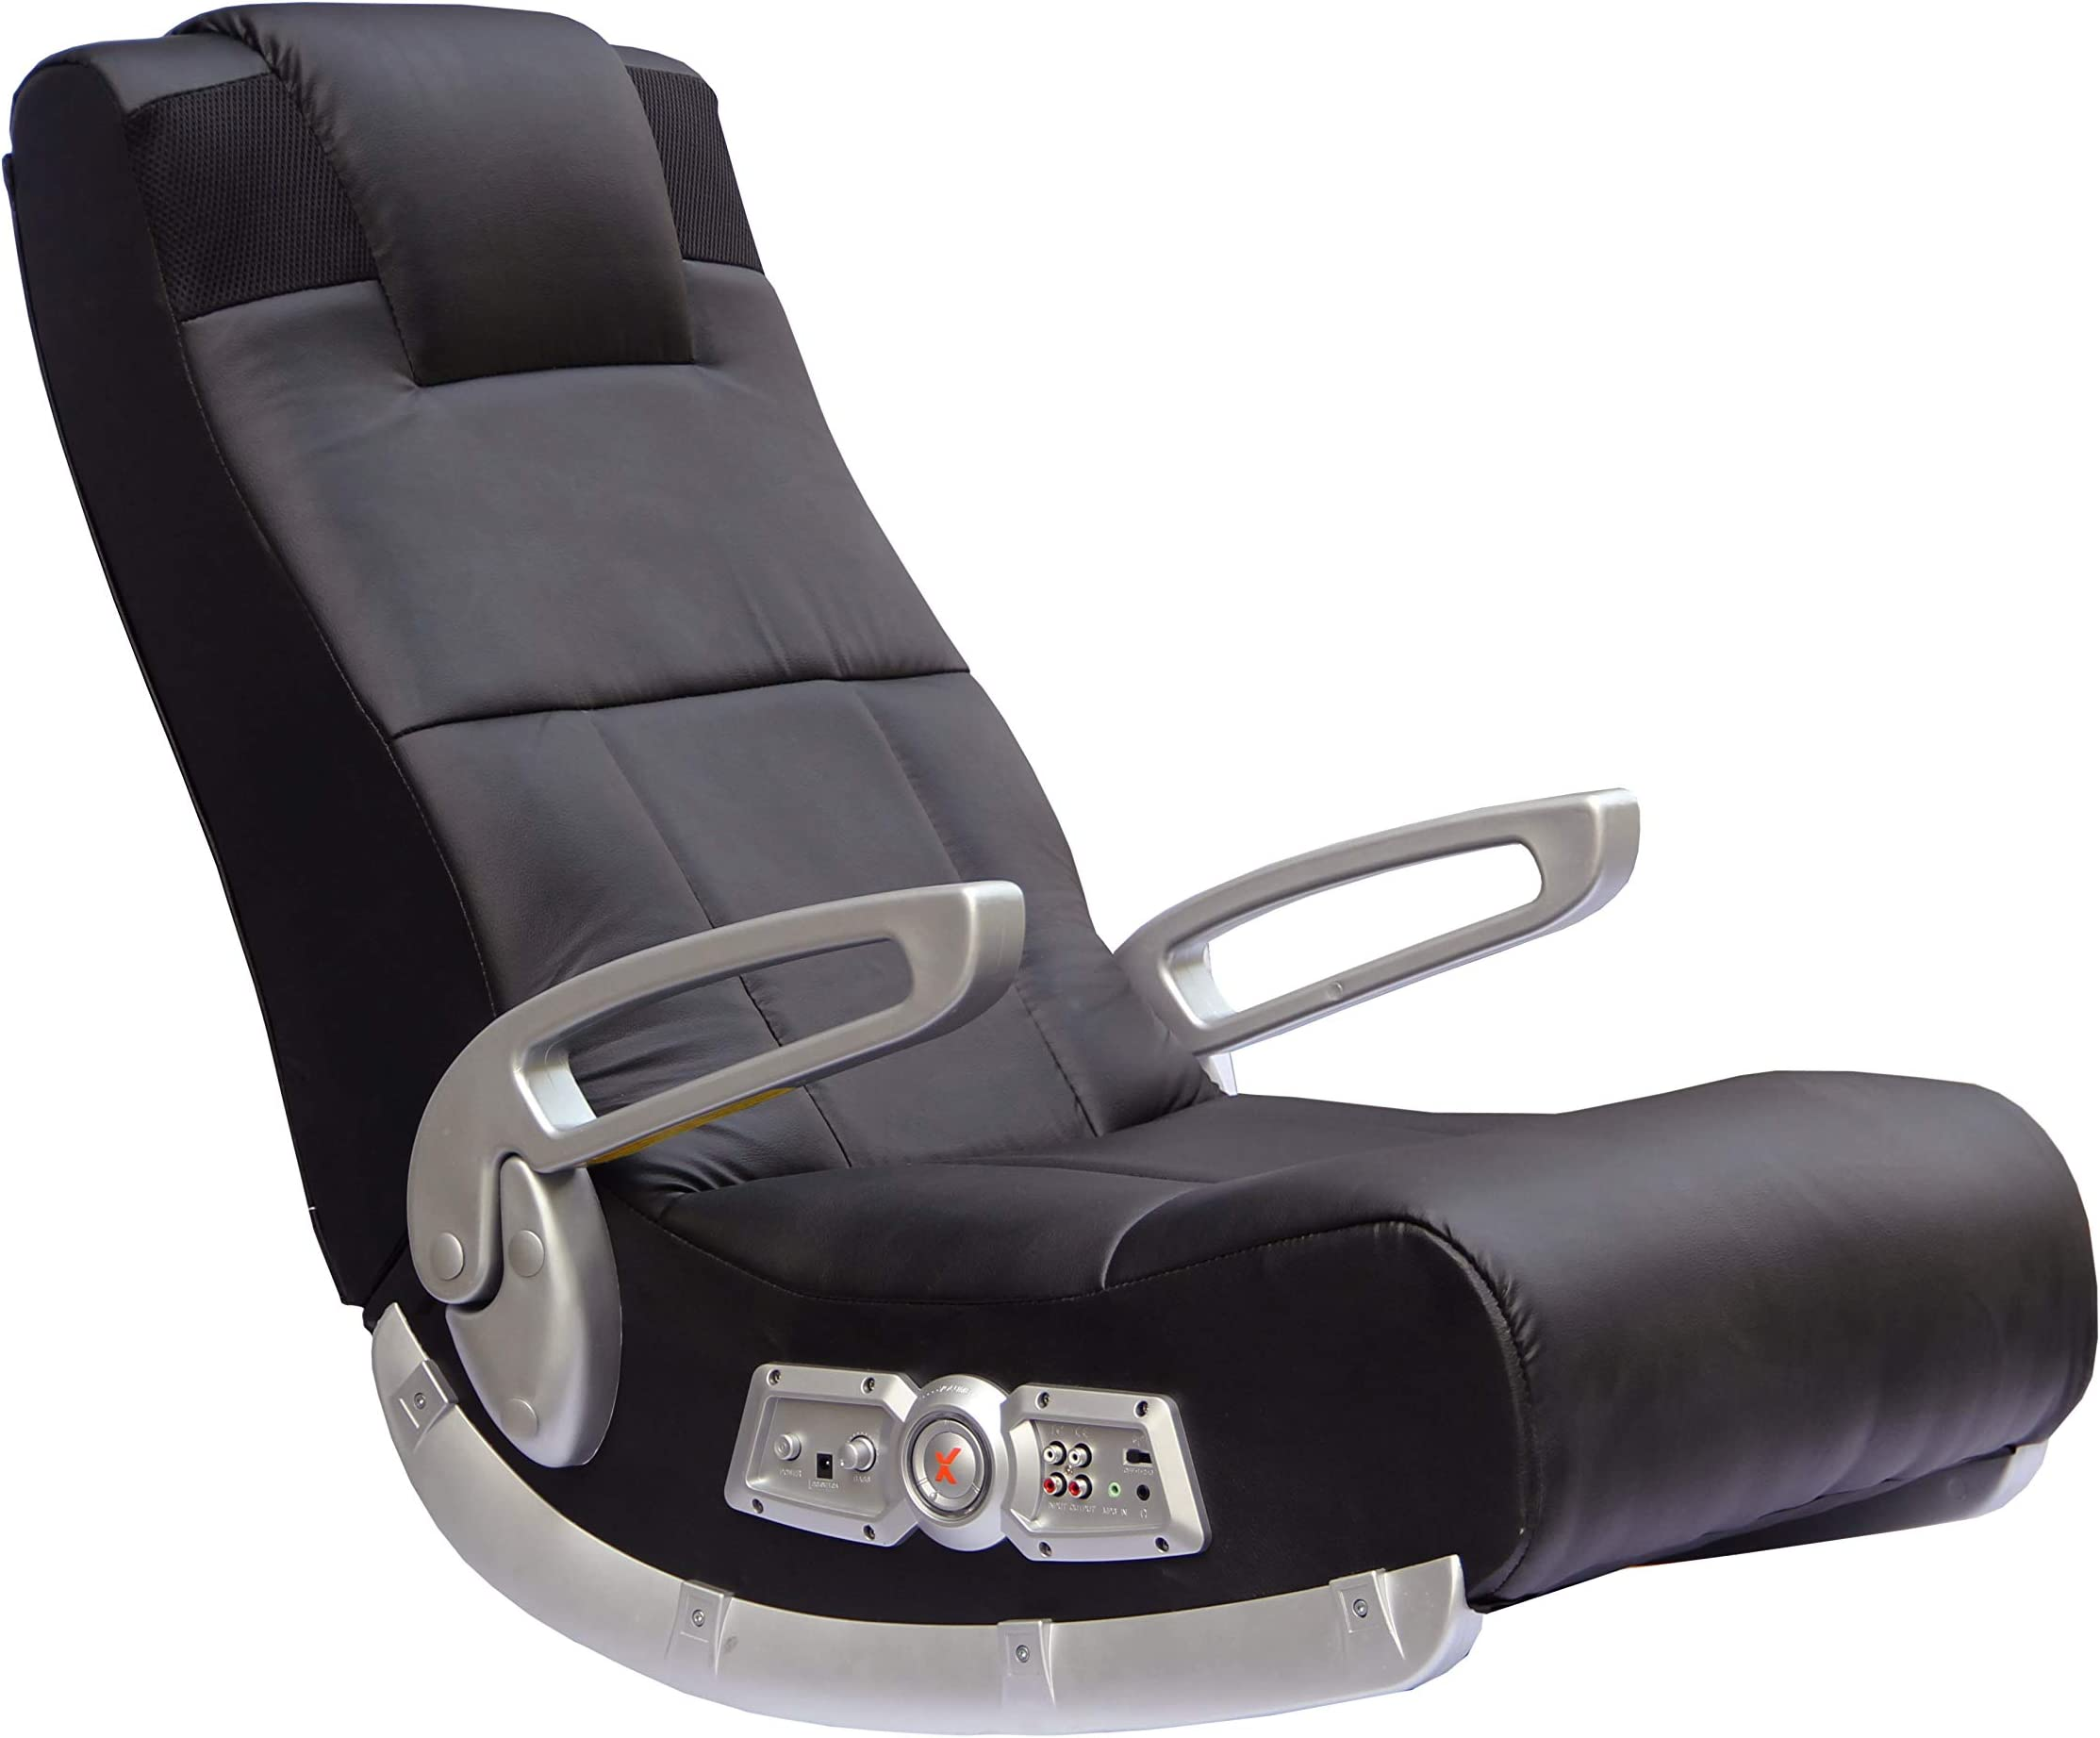 X Rocker, 5143601, II SE 2.1 Black Leather Floor Video Gaming Chair, 27.8 x 18.5 x 17.5, Black